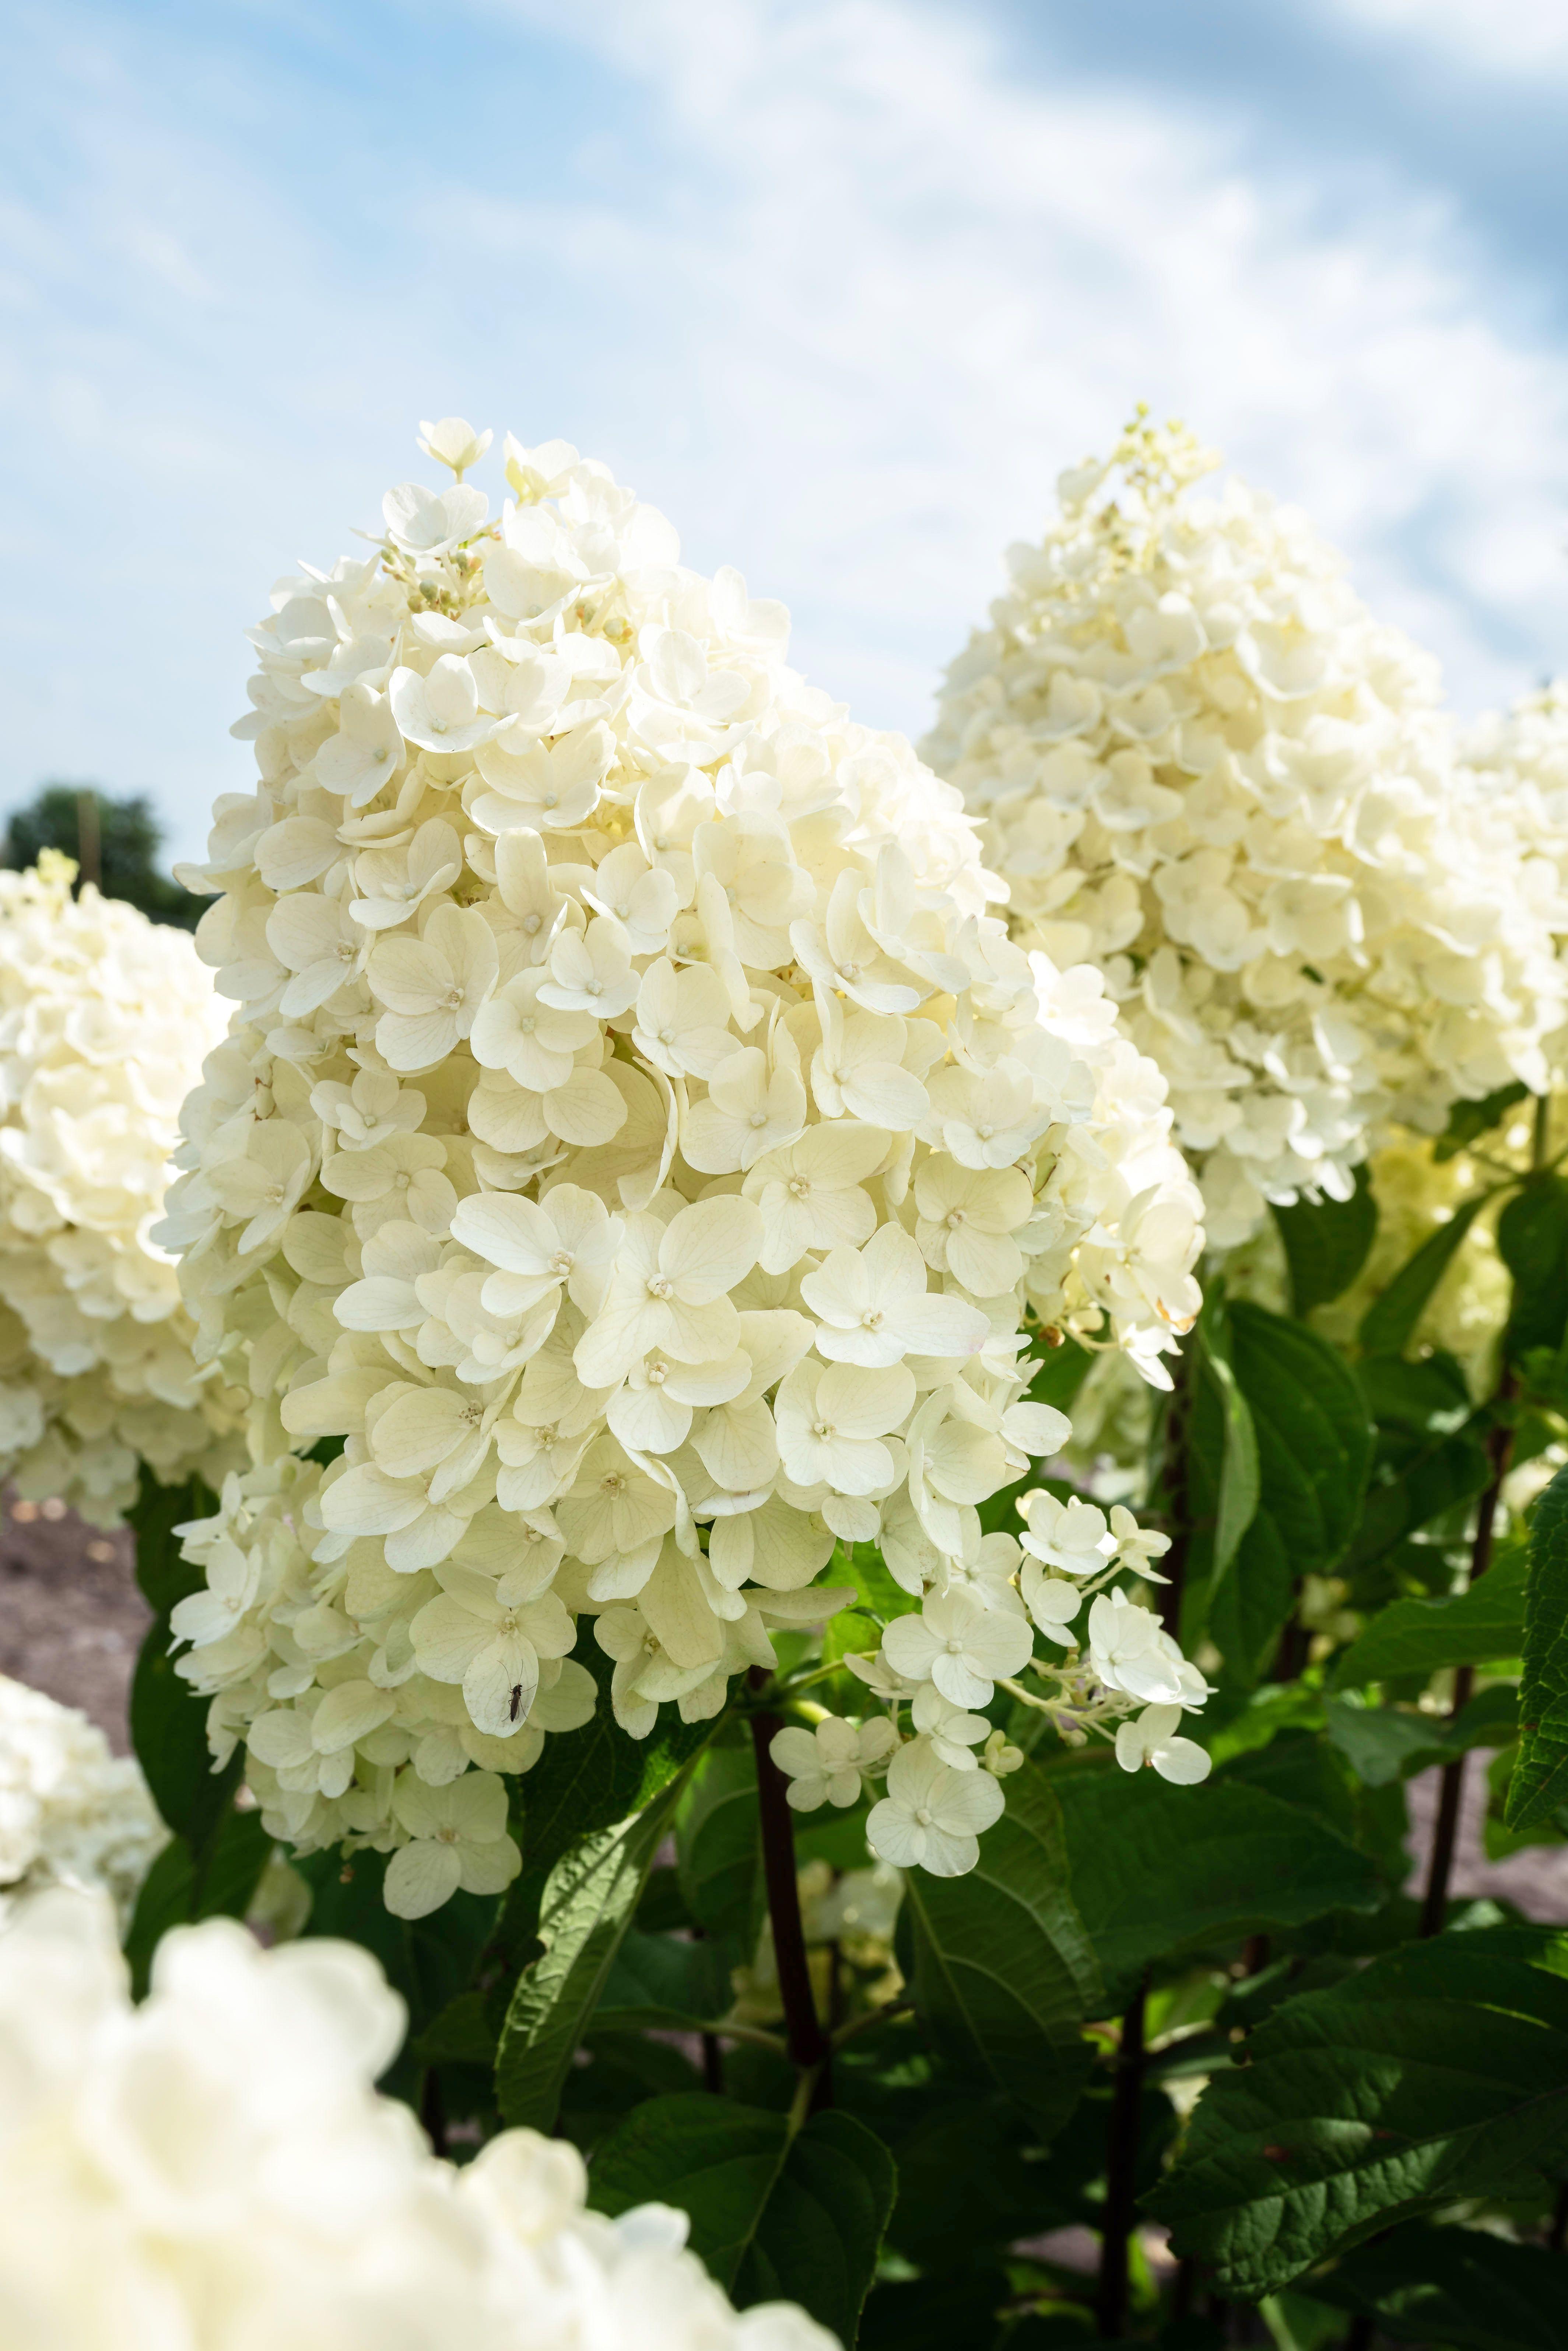 Hydrangea Living Summer Snow In 2020 Hydrangea Paniculata Snow In Summer Hydrangea